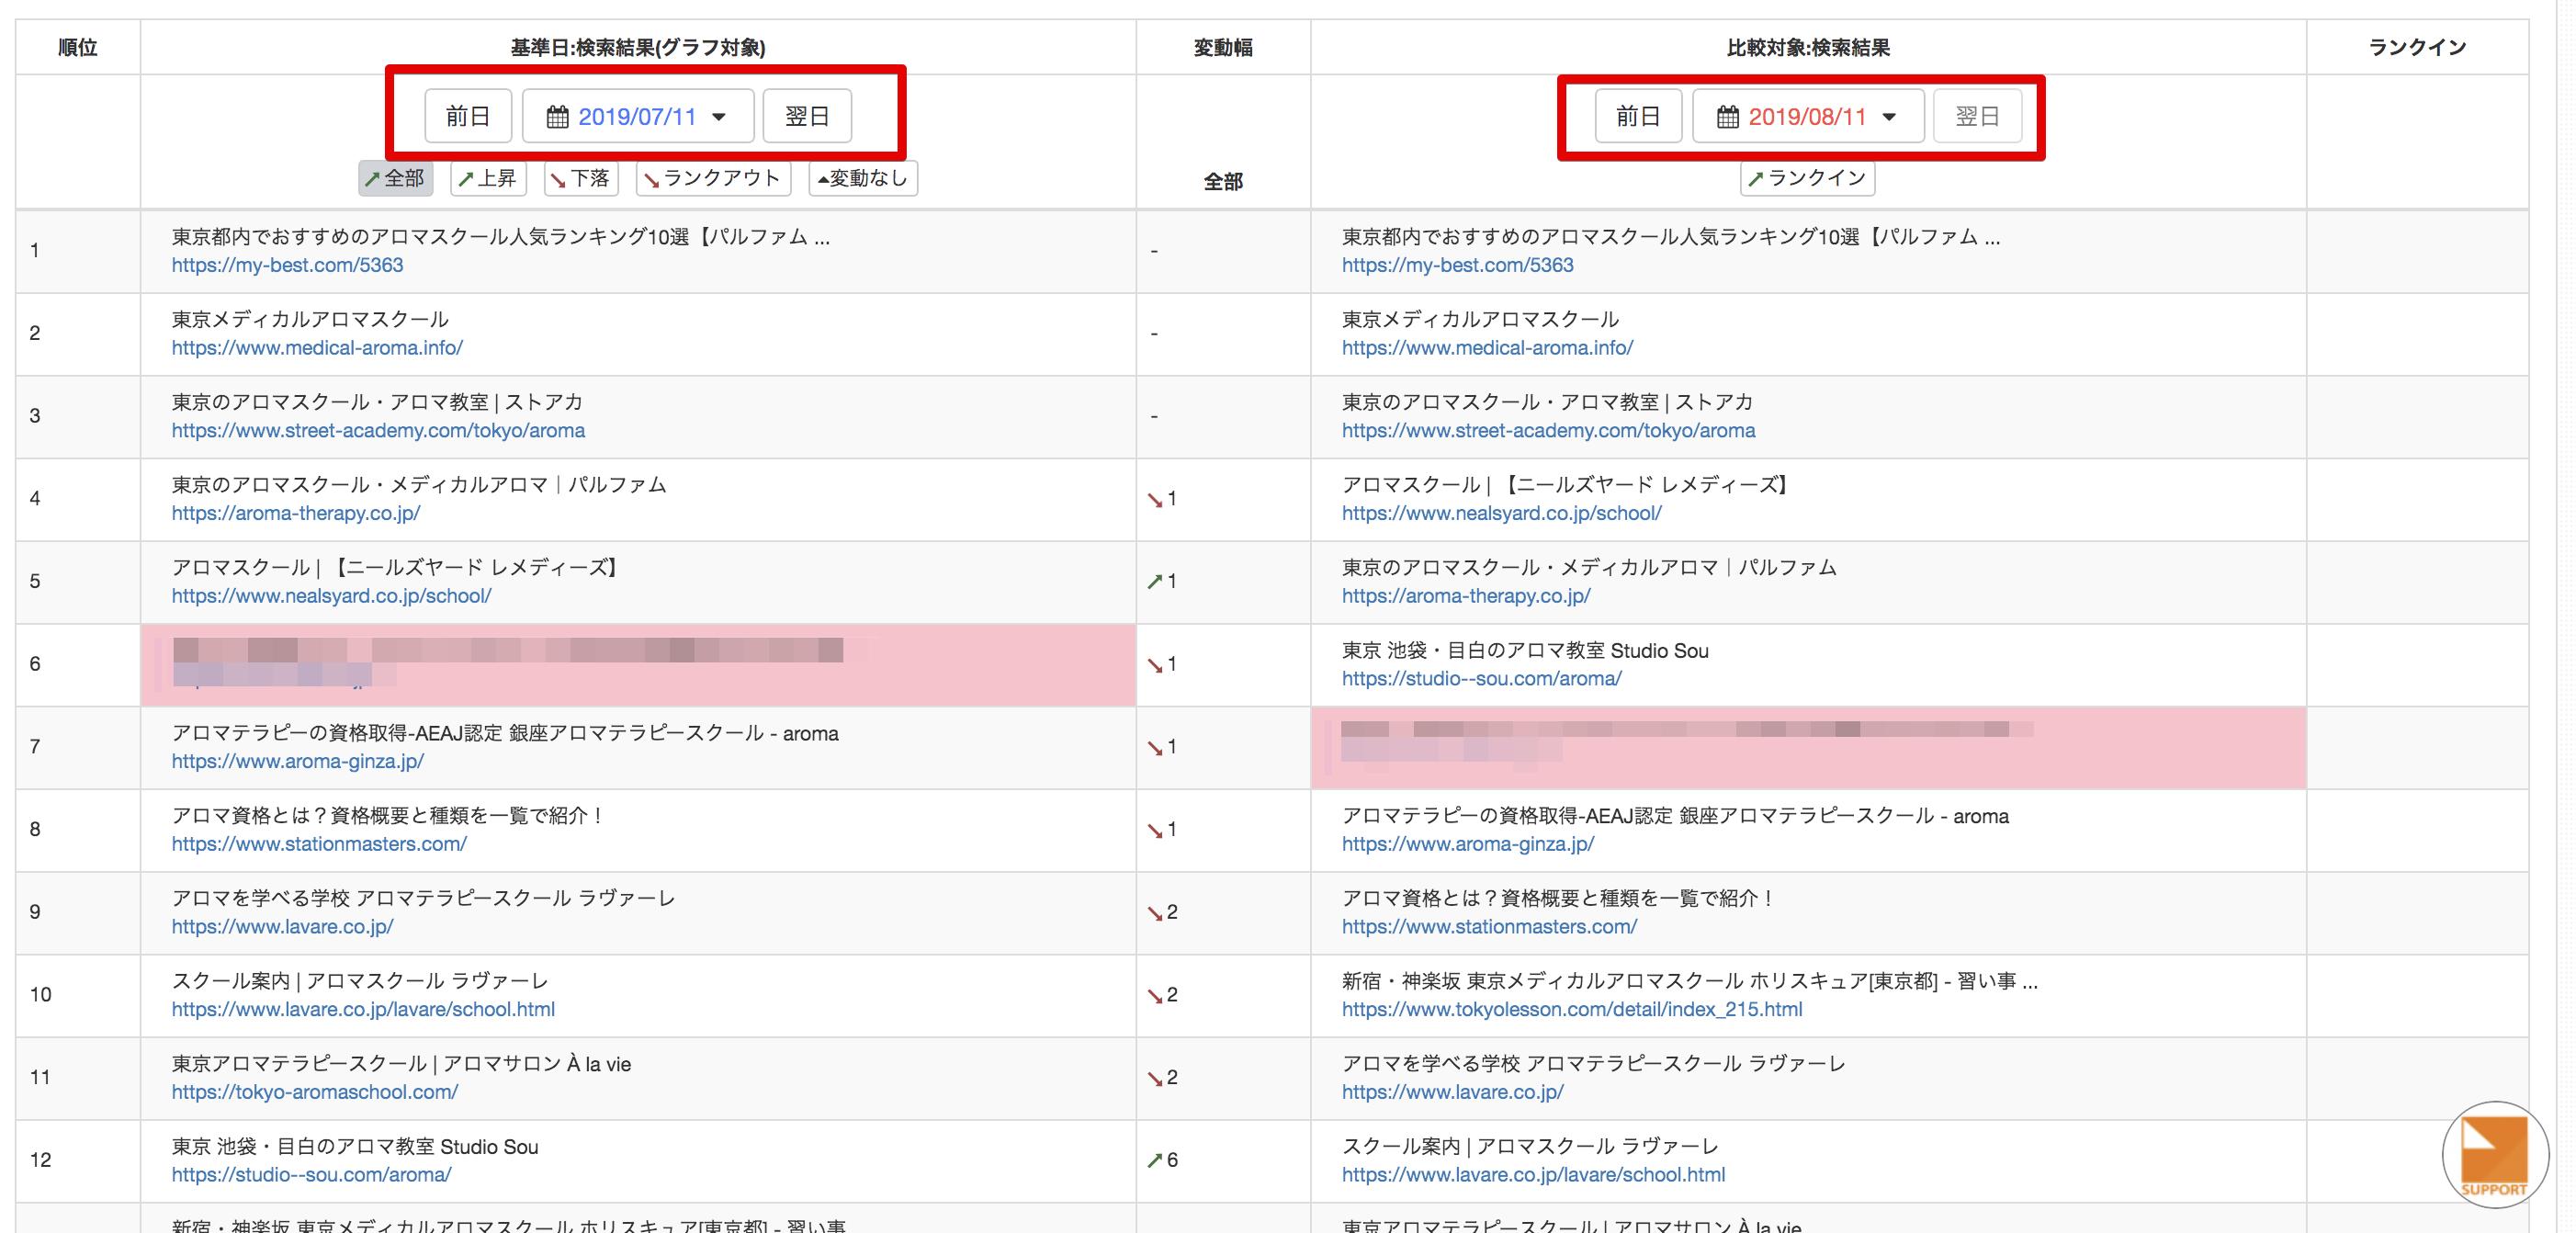 SEOチェックツール管理画面のランクインサイトの一覧